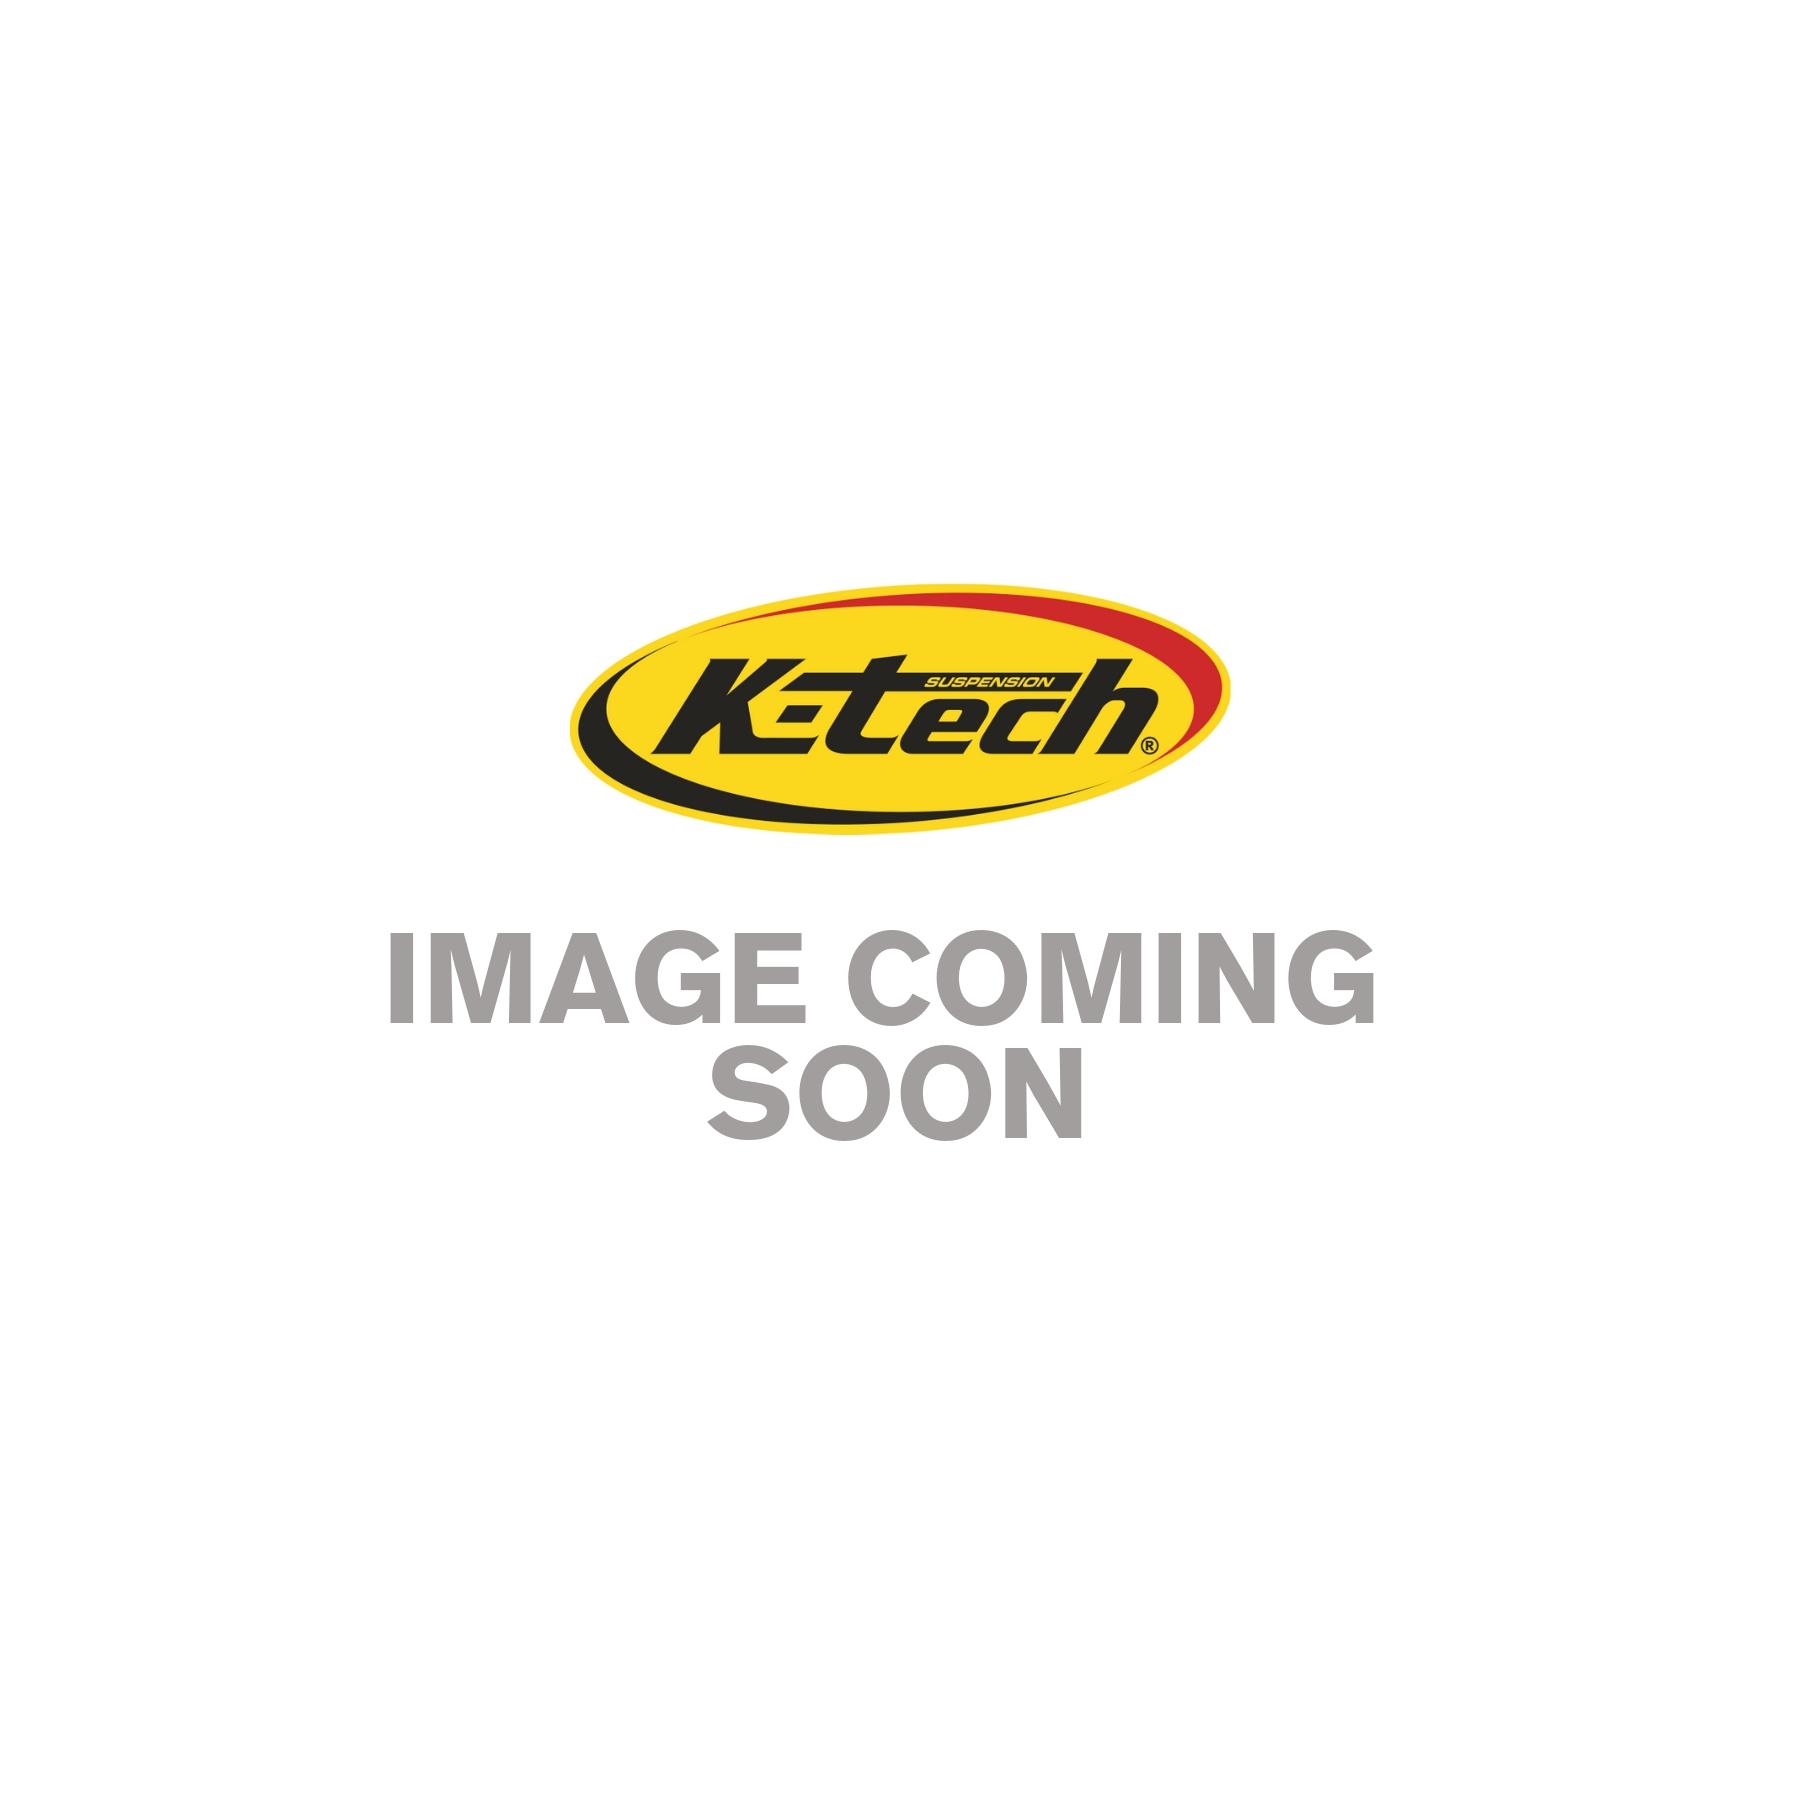 Tracker Front Fork Cartridges Triumph Bonneville Bobber 2017> KYB